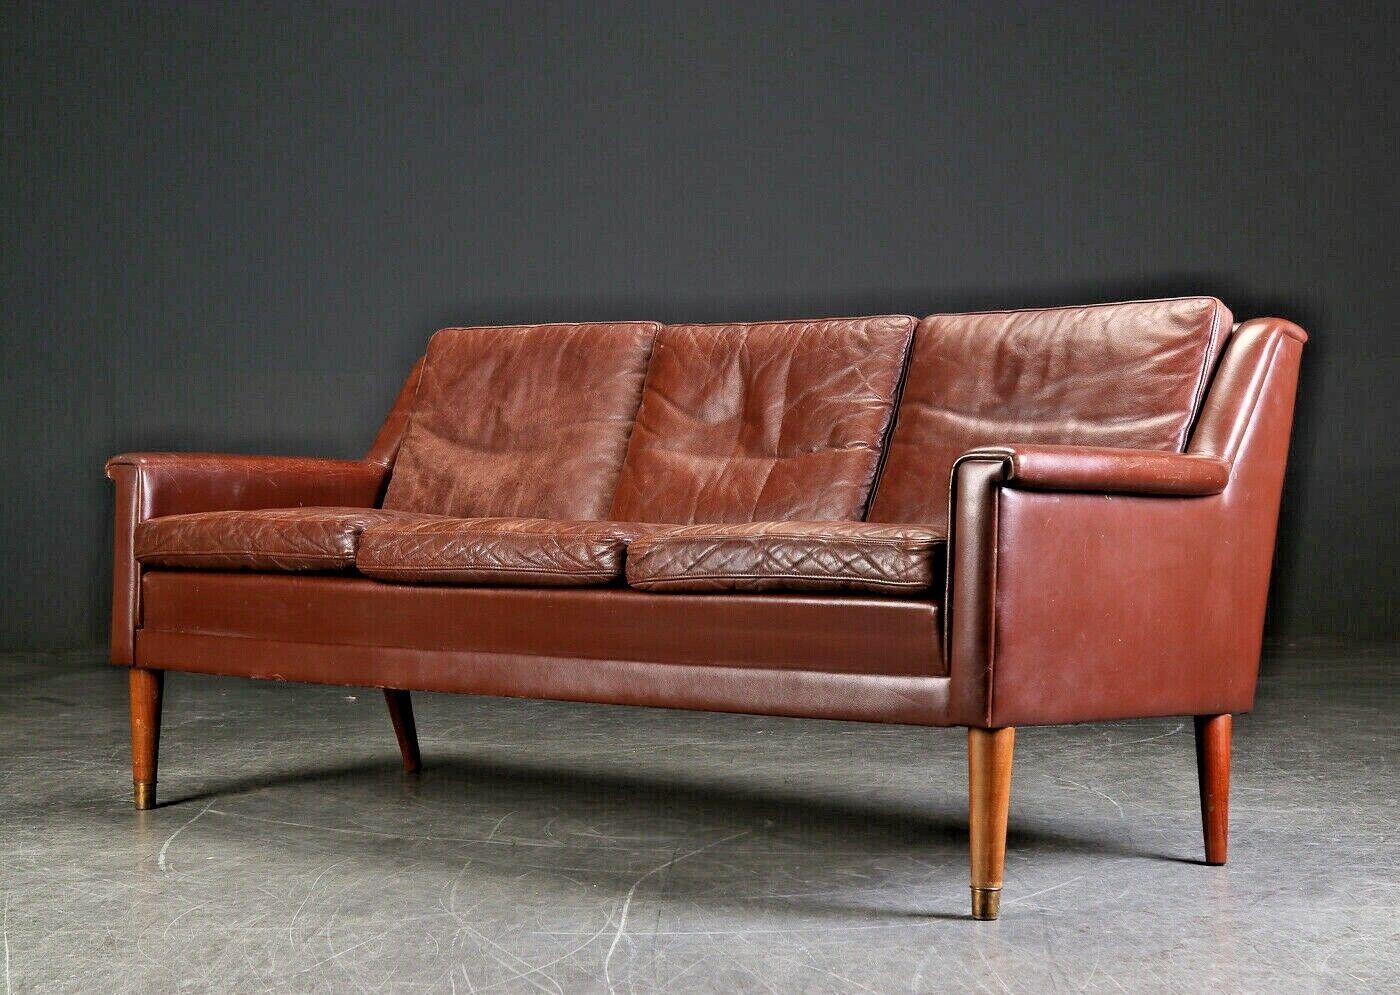 Vintage Retro Danish Thams 3 Seater Brown Leather Sofa 1960 S